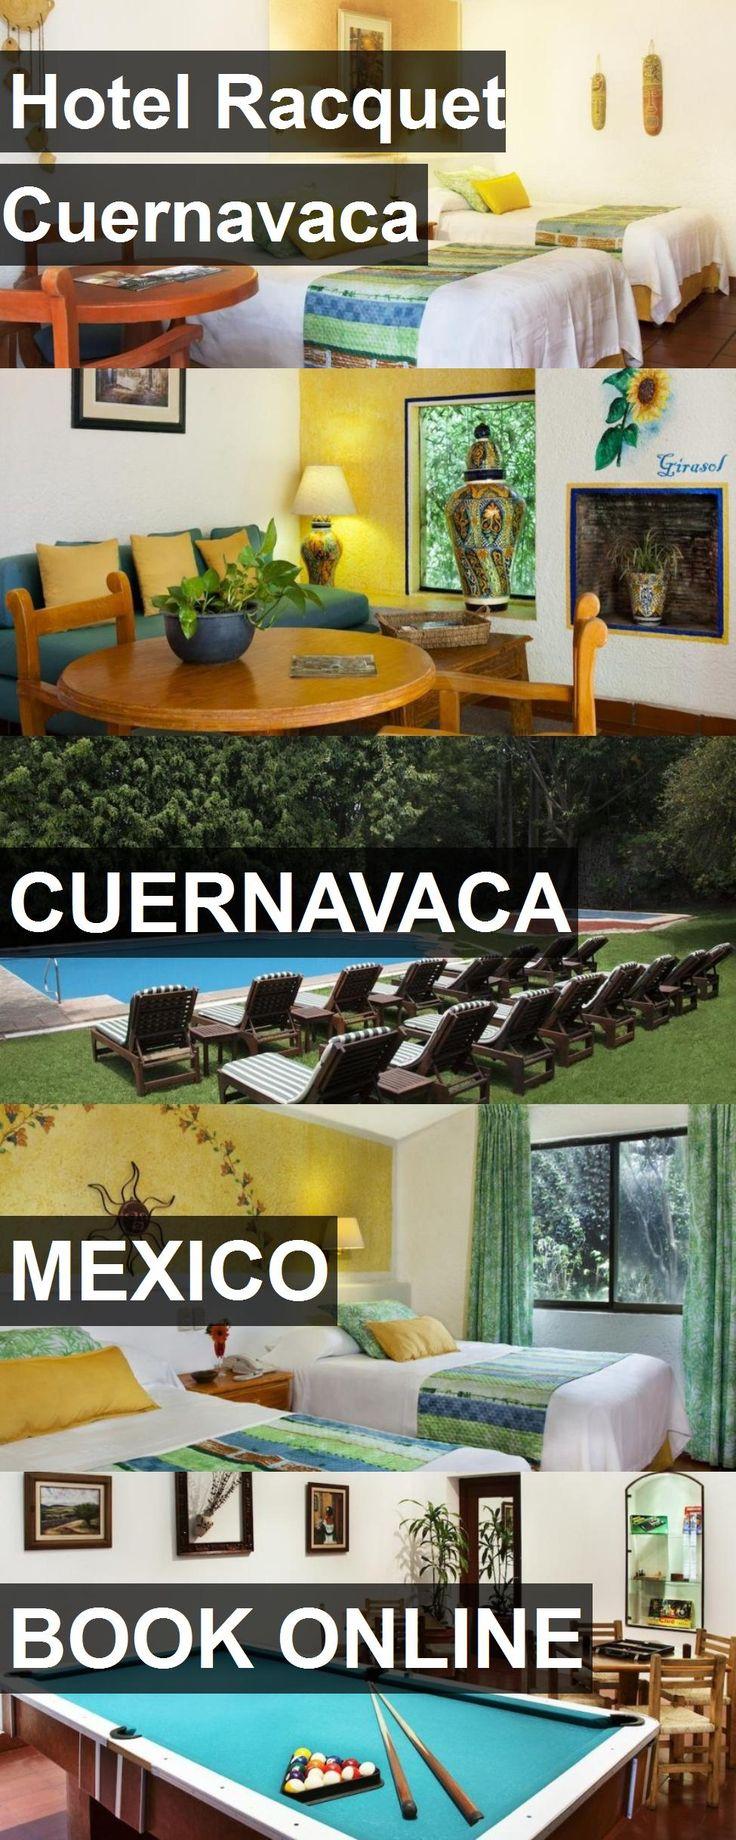 Hotel Racquet Cuernavaca in Cuernavaca, Mexico. For more information, photos, reviews and best prices please follow the link. #Mexico #Cuernavaca #travel #vacation #hotel